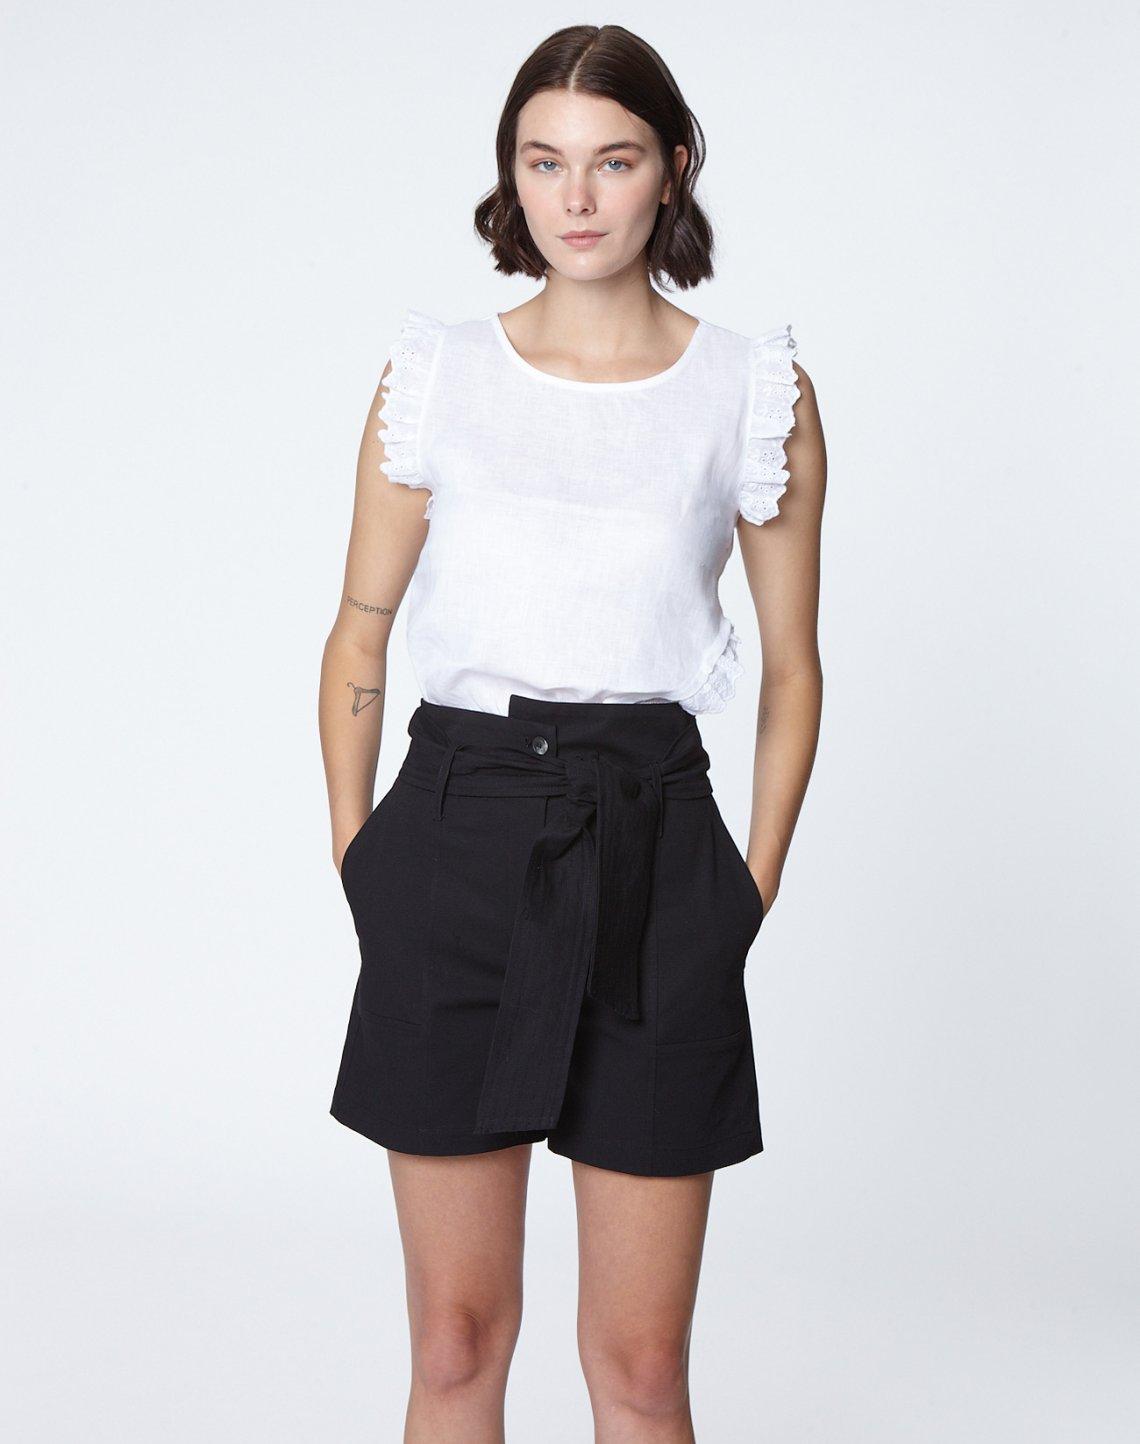 Belted bermuda shorts